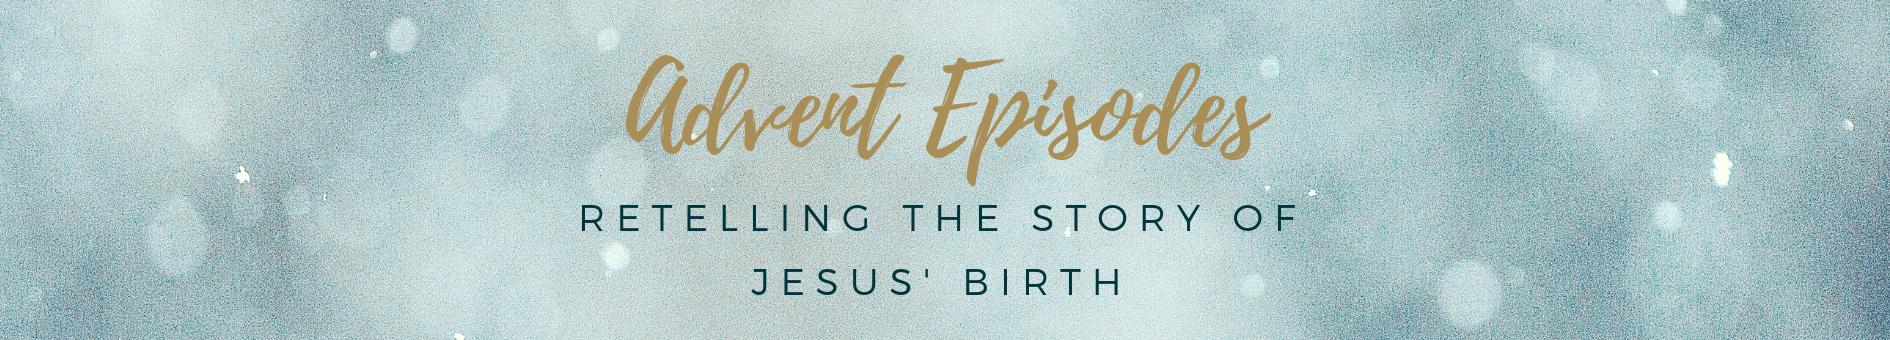 Advent Episodes